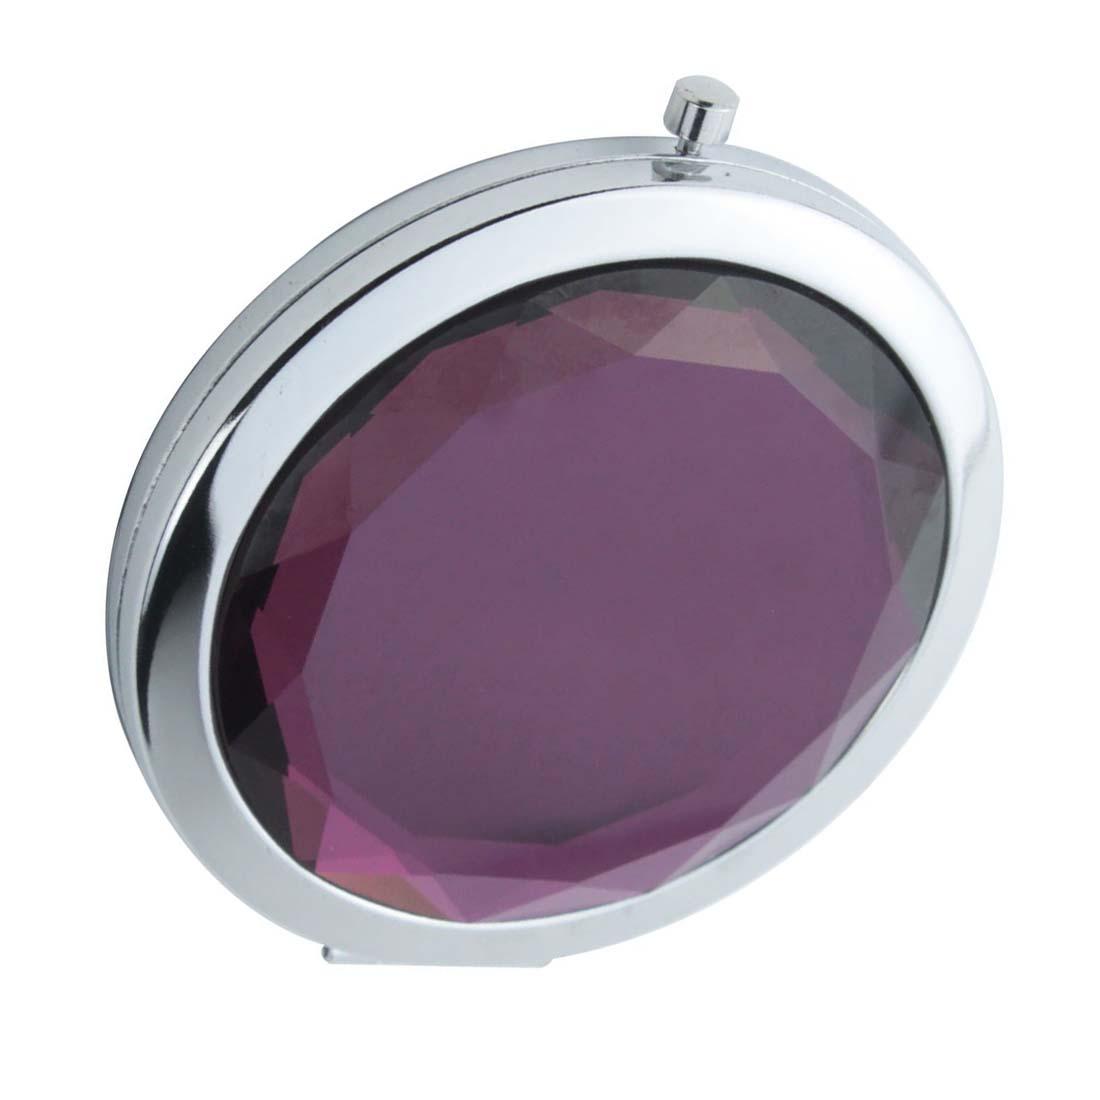 Travel compact pocket crystal folding makeup mirror hp ebay for Makeup mirror